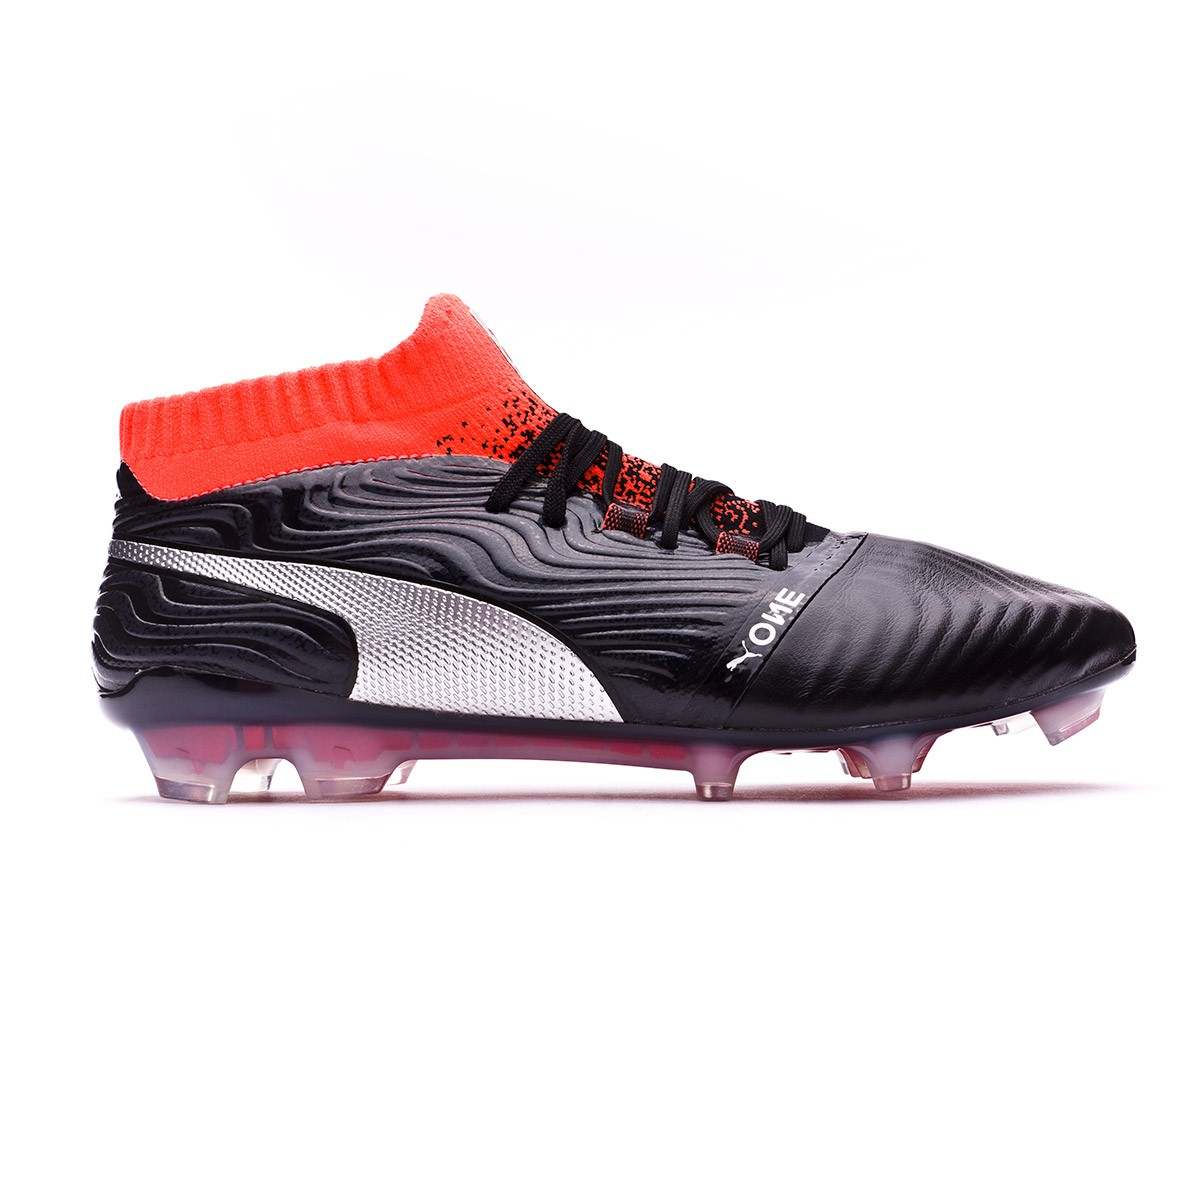 8115e697c4a4 Boot Puma One 18.1 FG Puma Black-Puma Silver-Red Blast - Football store  Fútbol Emotion